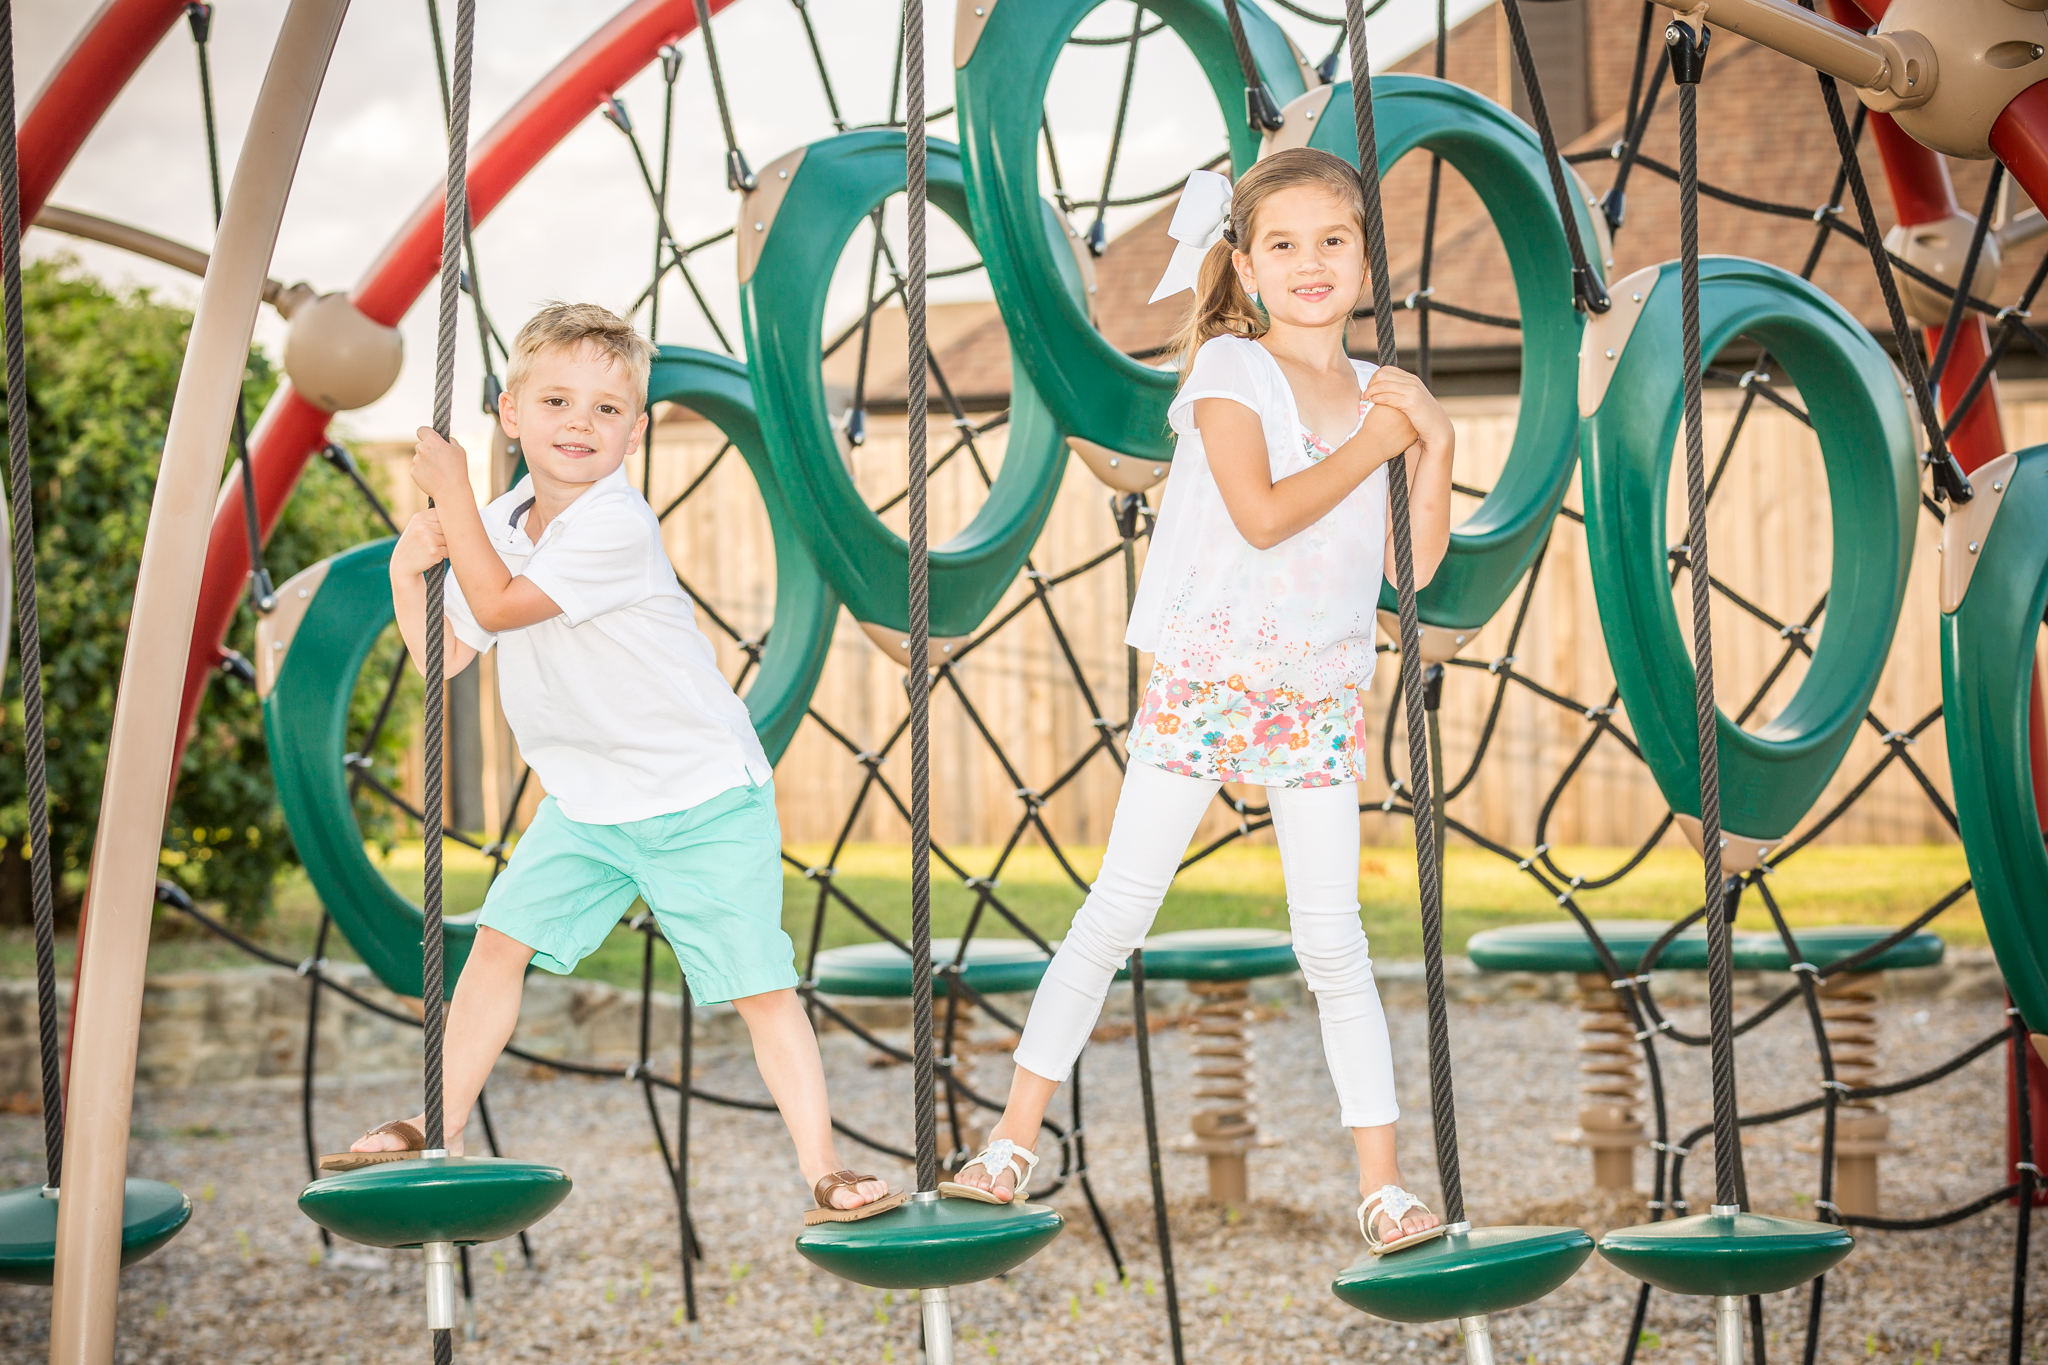 The Parks at Panchasarp Farms playground amenities pool walking trails John Houston Custom Homes